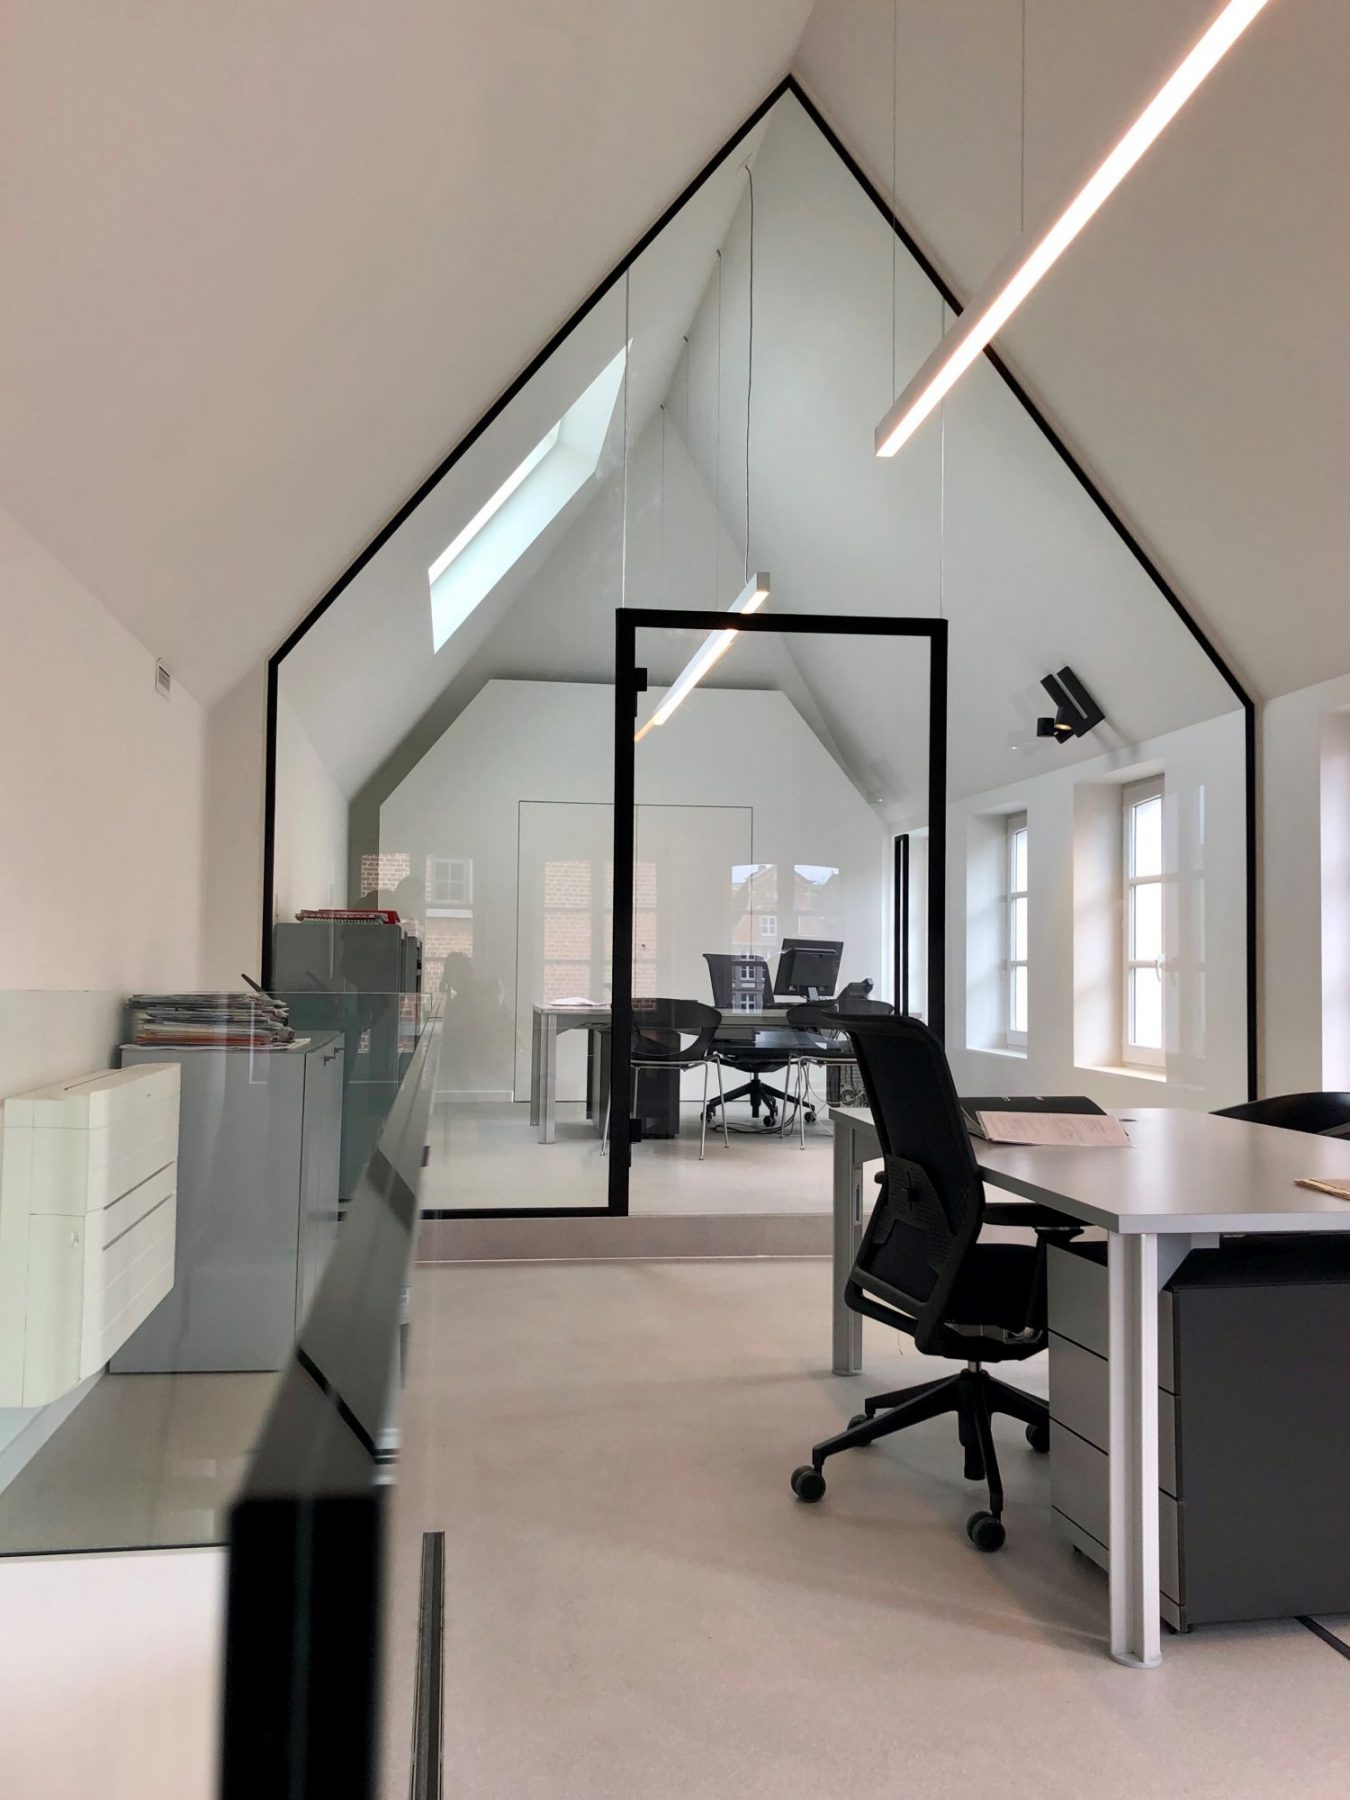 https://allglas.be/wp-content/uploads/2021/06/all-glas-walschaerts-bonheiden-interieurglas-steellook-glaswand-immovos-06-1-scaled.jpg